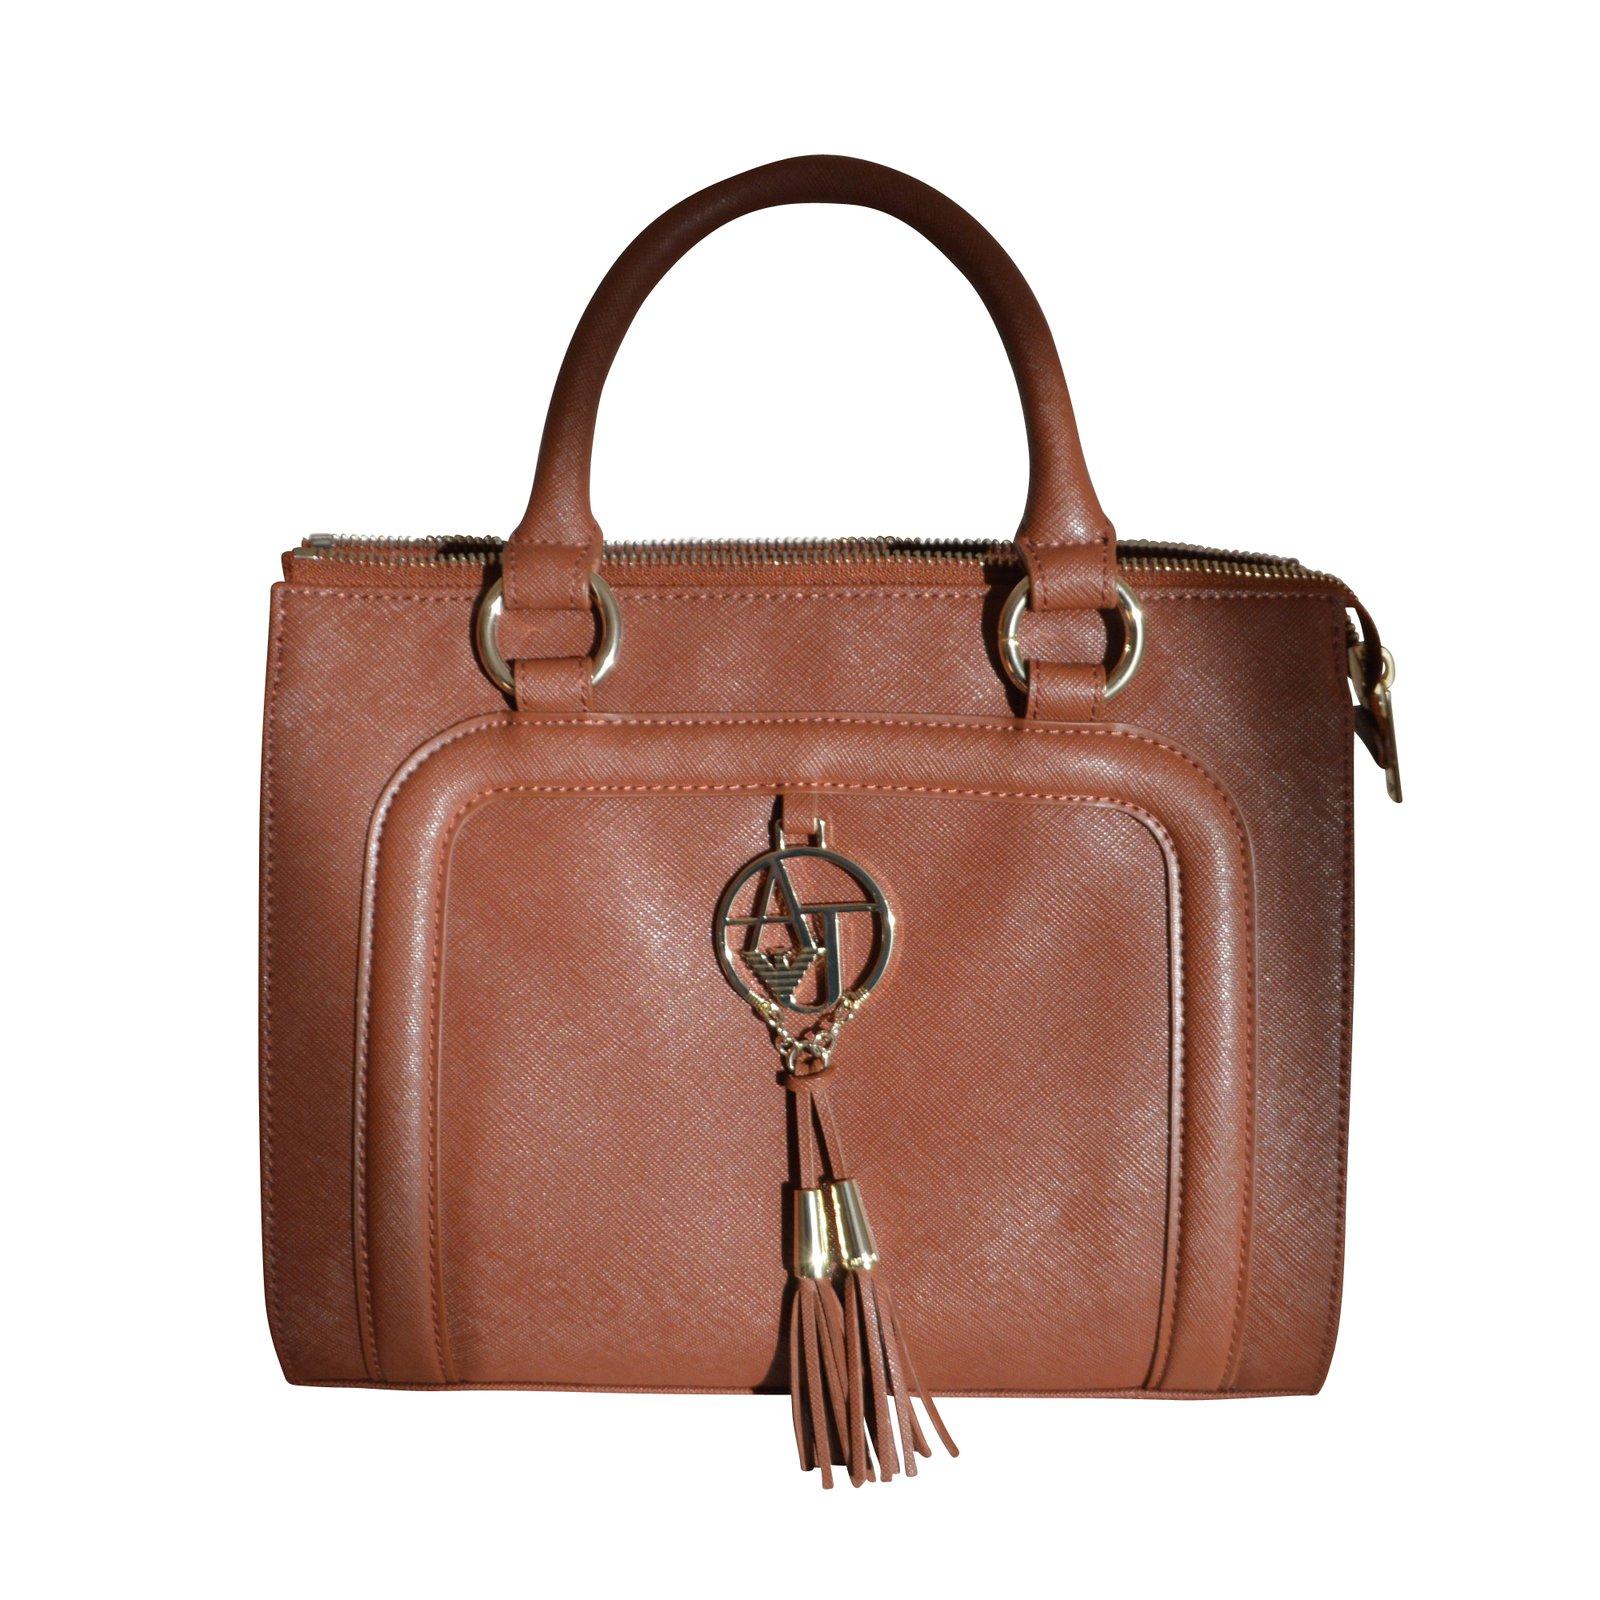 ... Giorgio Armani Handbags Leather Caramel Ref 6751 Joli Closet premium  selection 38599 0a783 ... 7b7ab4e08855e